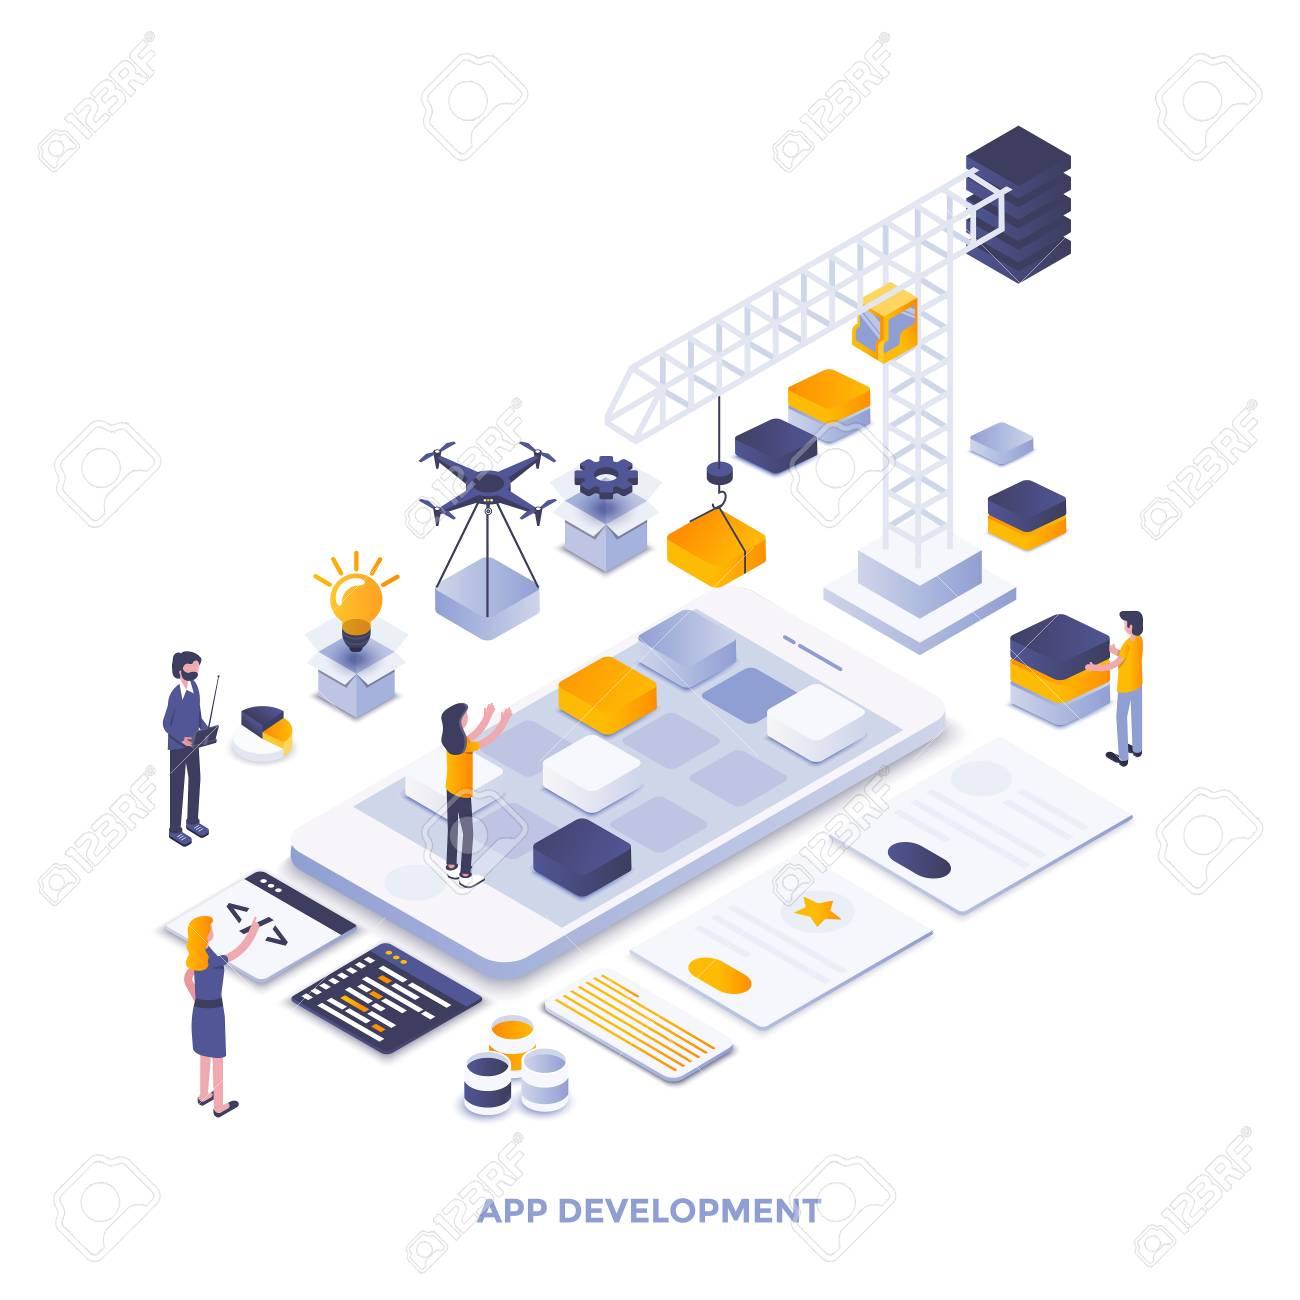 Modern flat design isometric illustration of App development